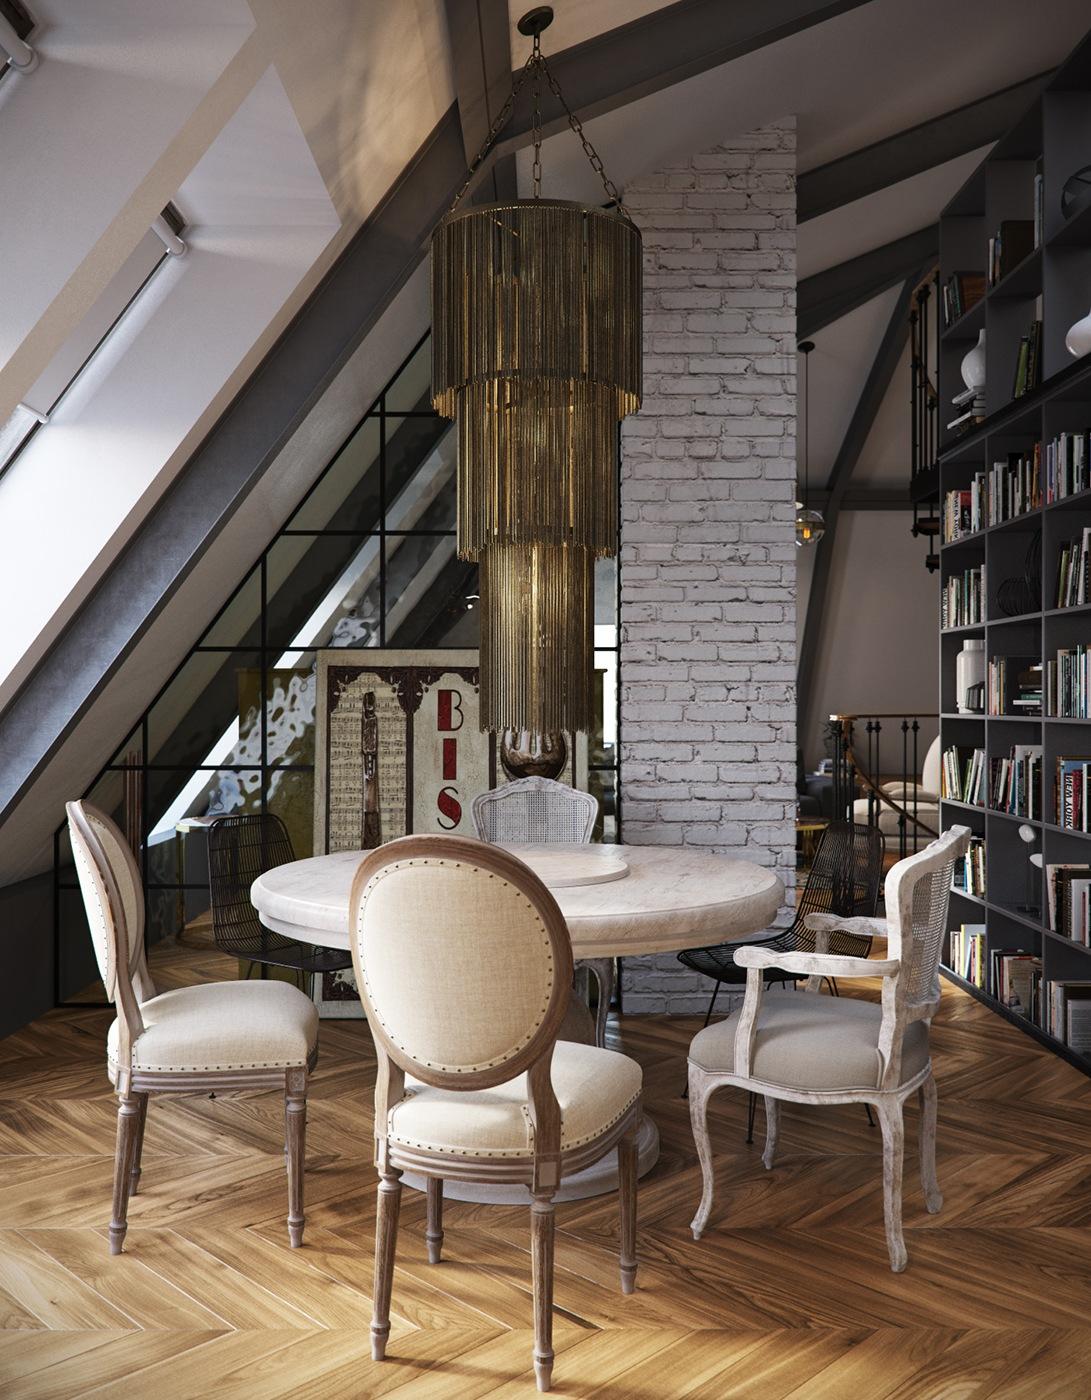 dining room concept design